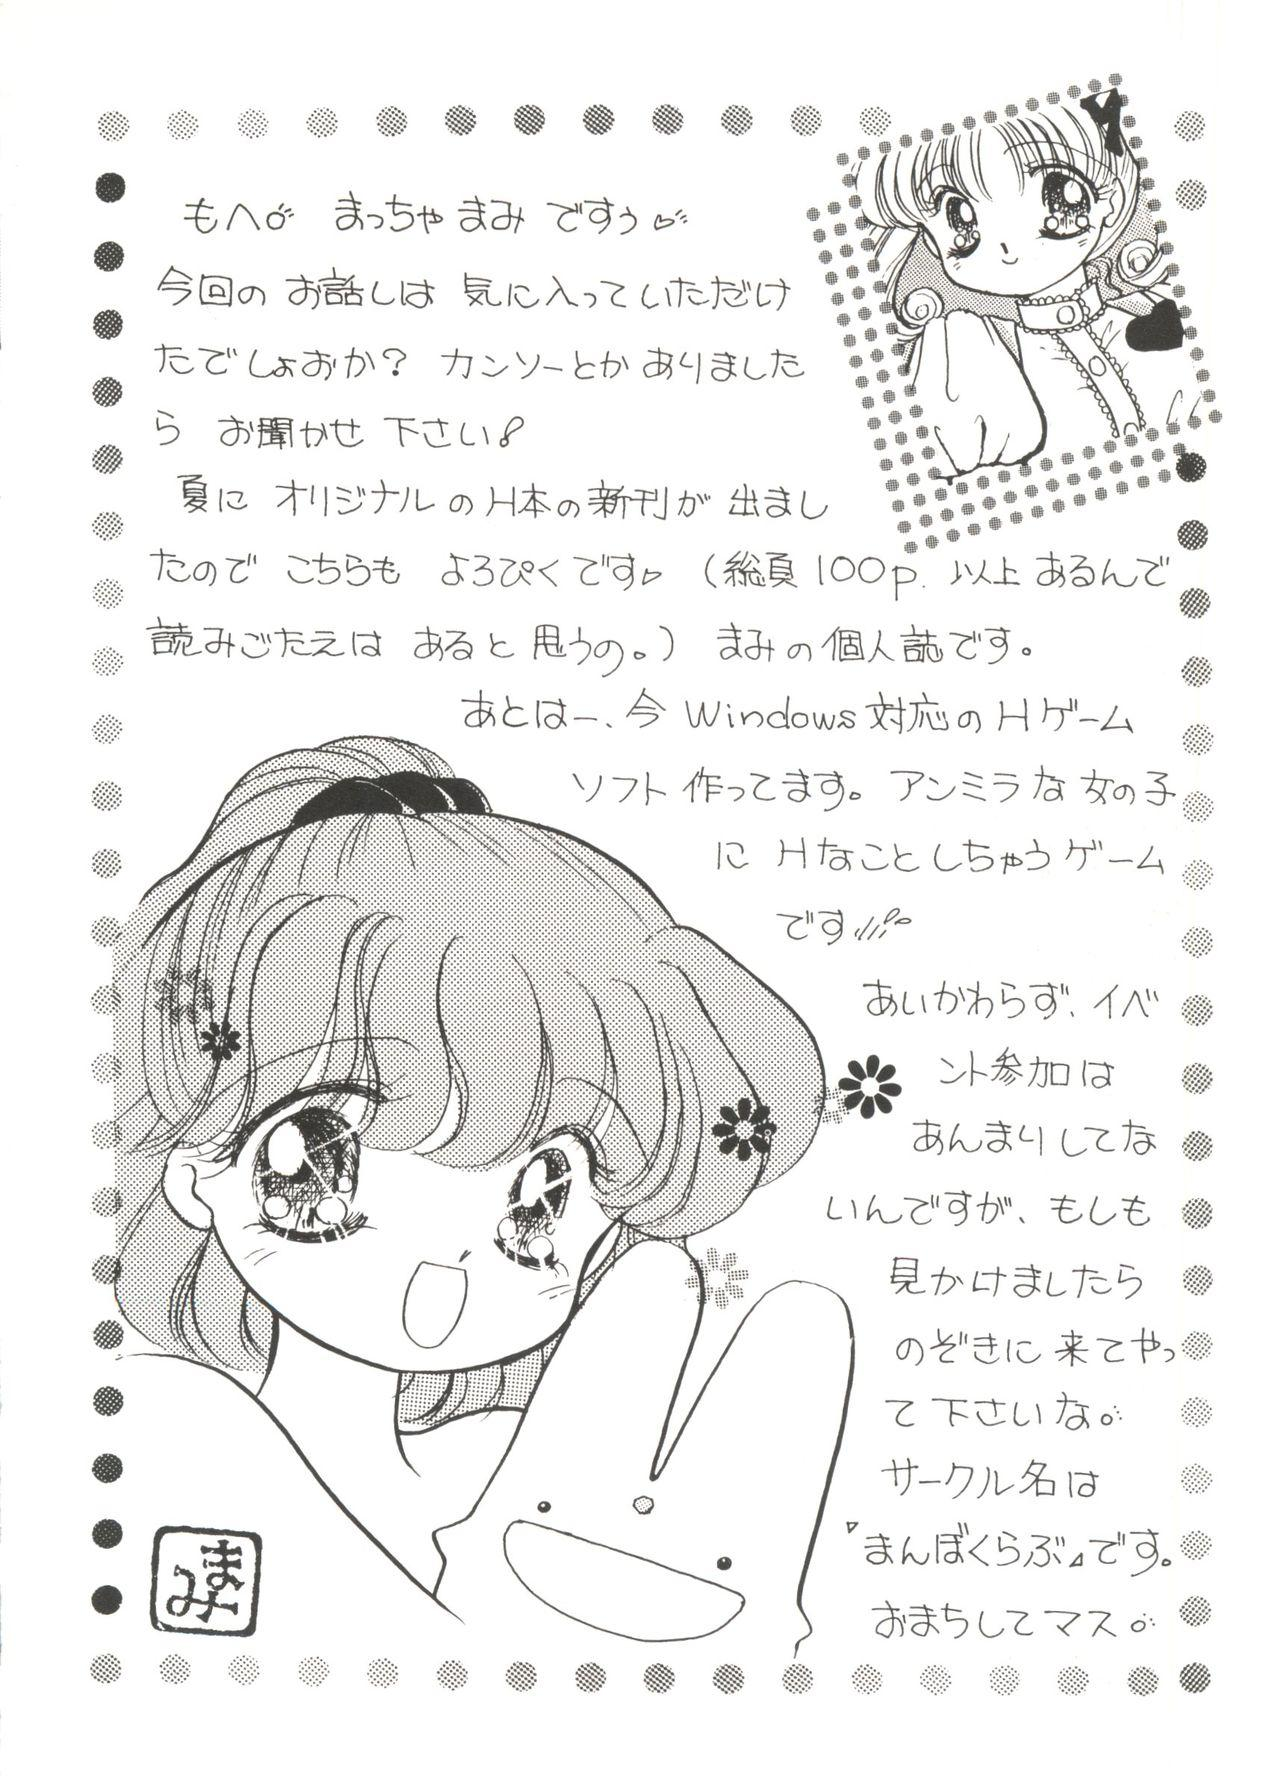 Bishoujo Doujin Peach Club - Pretty Gal's Fanzine Peach Club 9 107